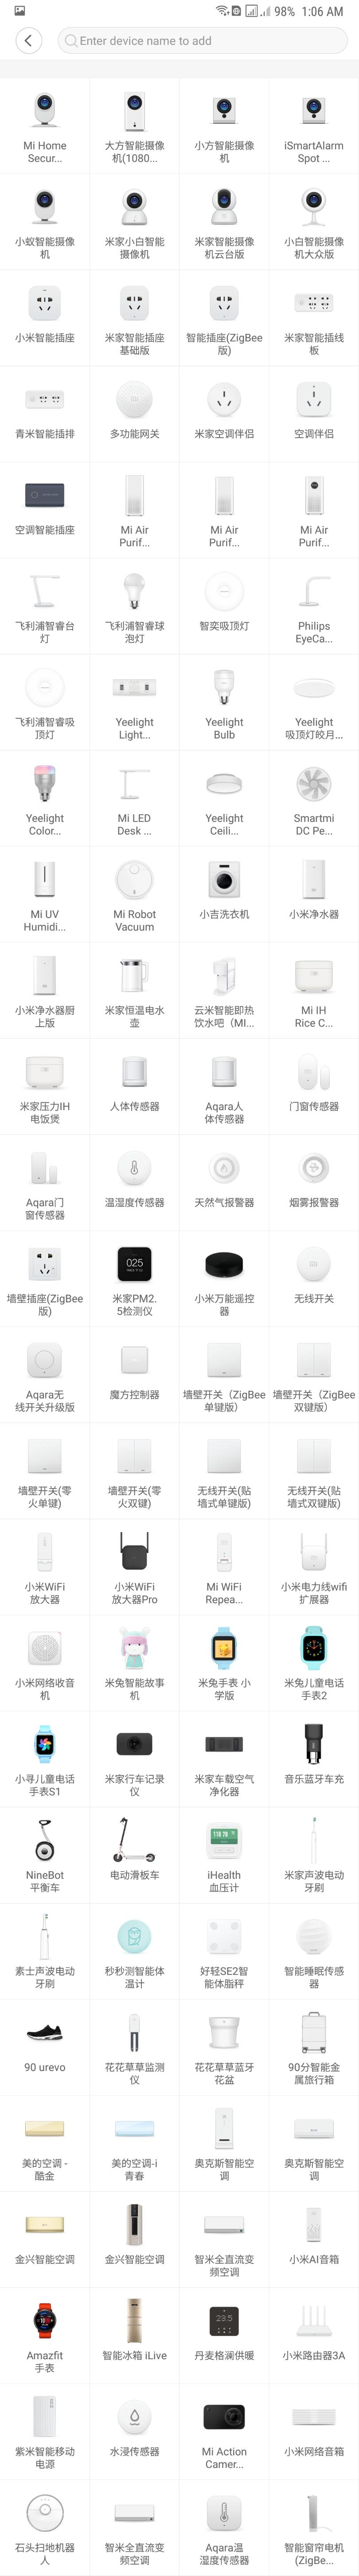 Mi gateway on Singapore server - Third Party Integration